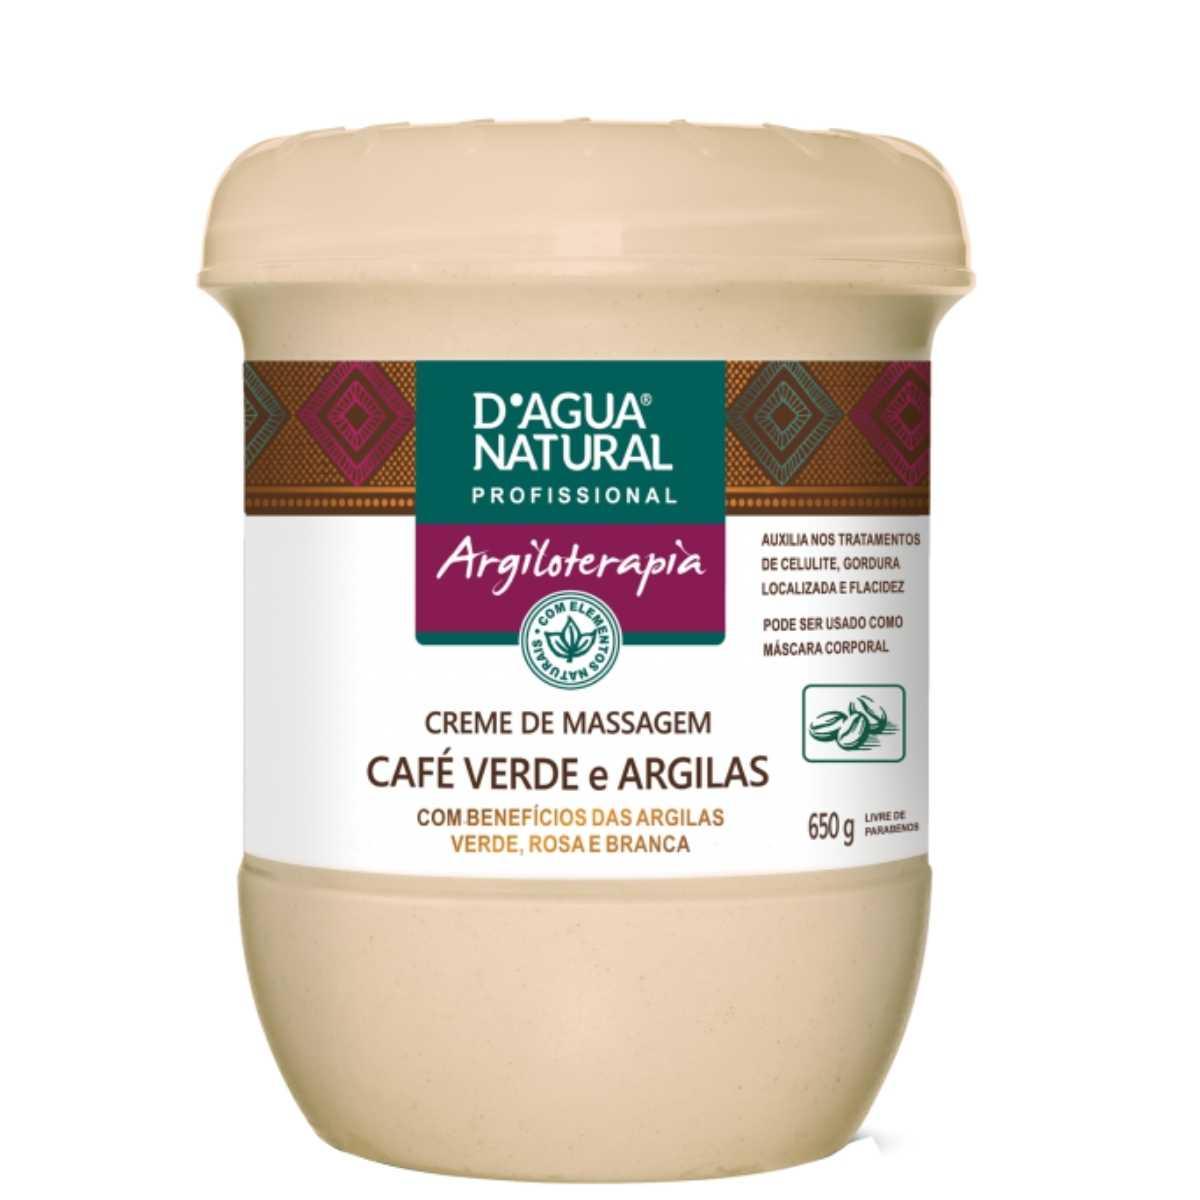 Creme de Massagem Argiloterapia Café Verde e Argilas 650g  - Emphática